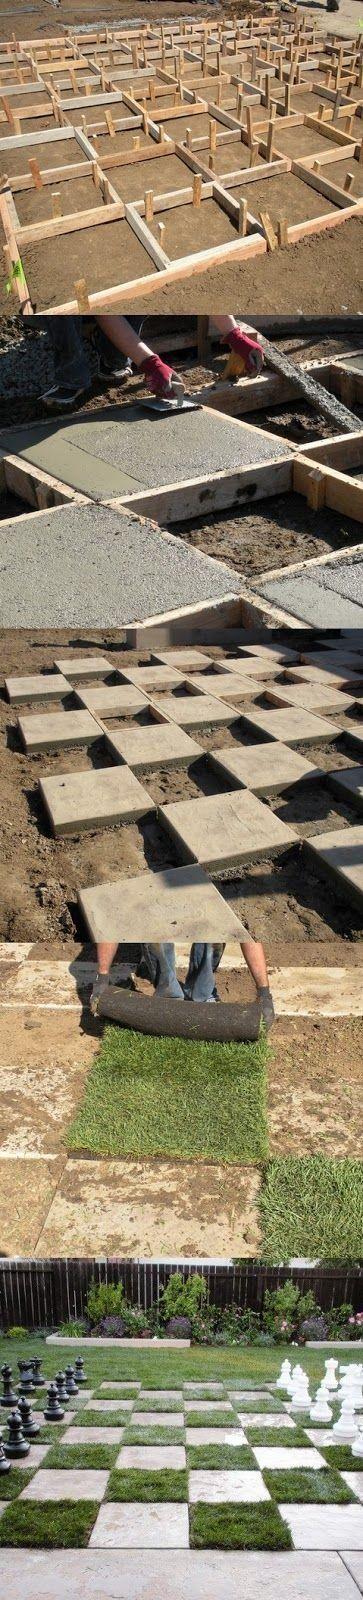 Make a Giant Chess Board In Your Backyard ♥Follow us♥